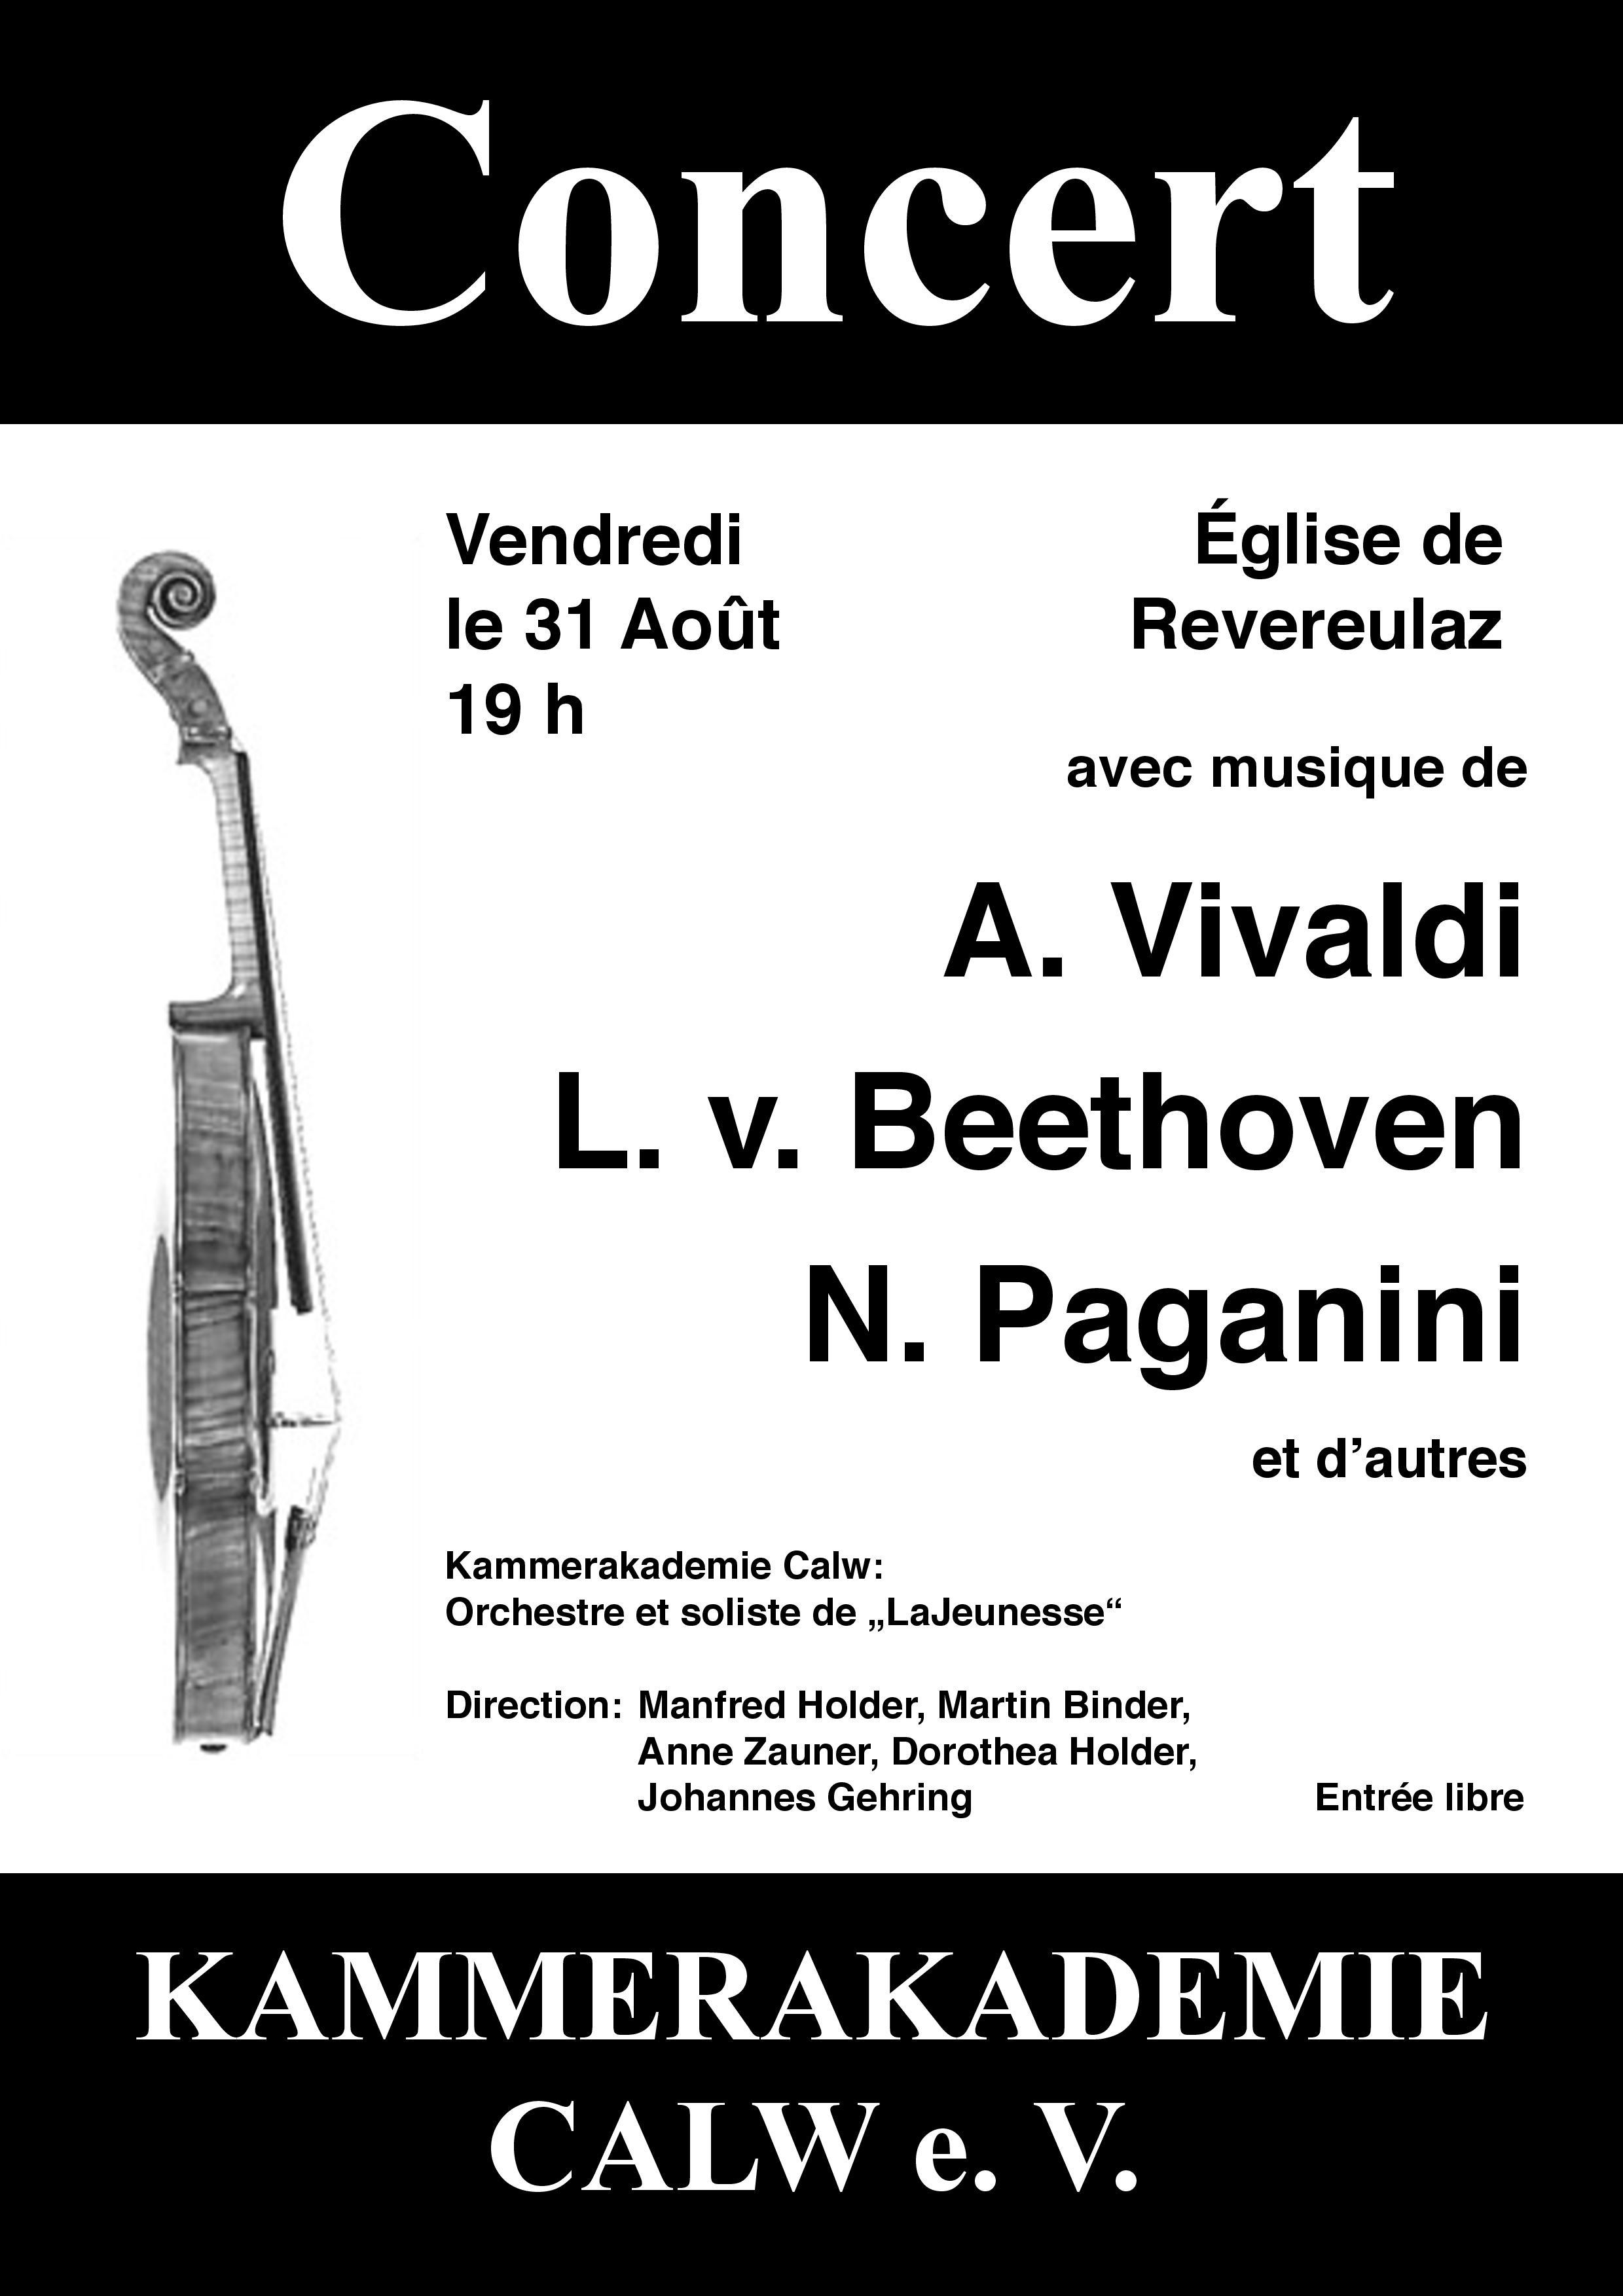 Concert de la Kammerakademie Calw à l'Eglise de Revereulaz @  |  |